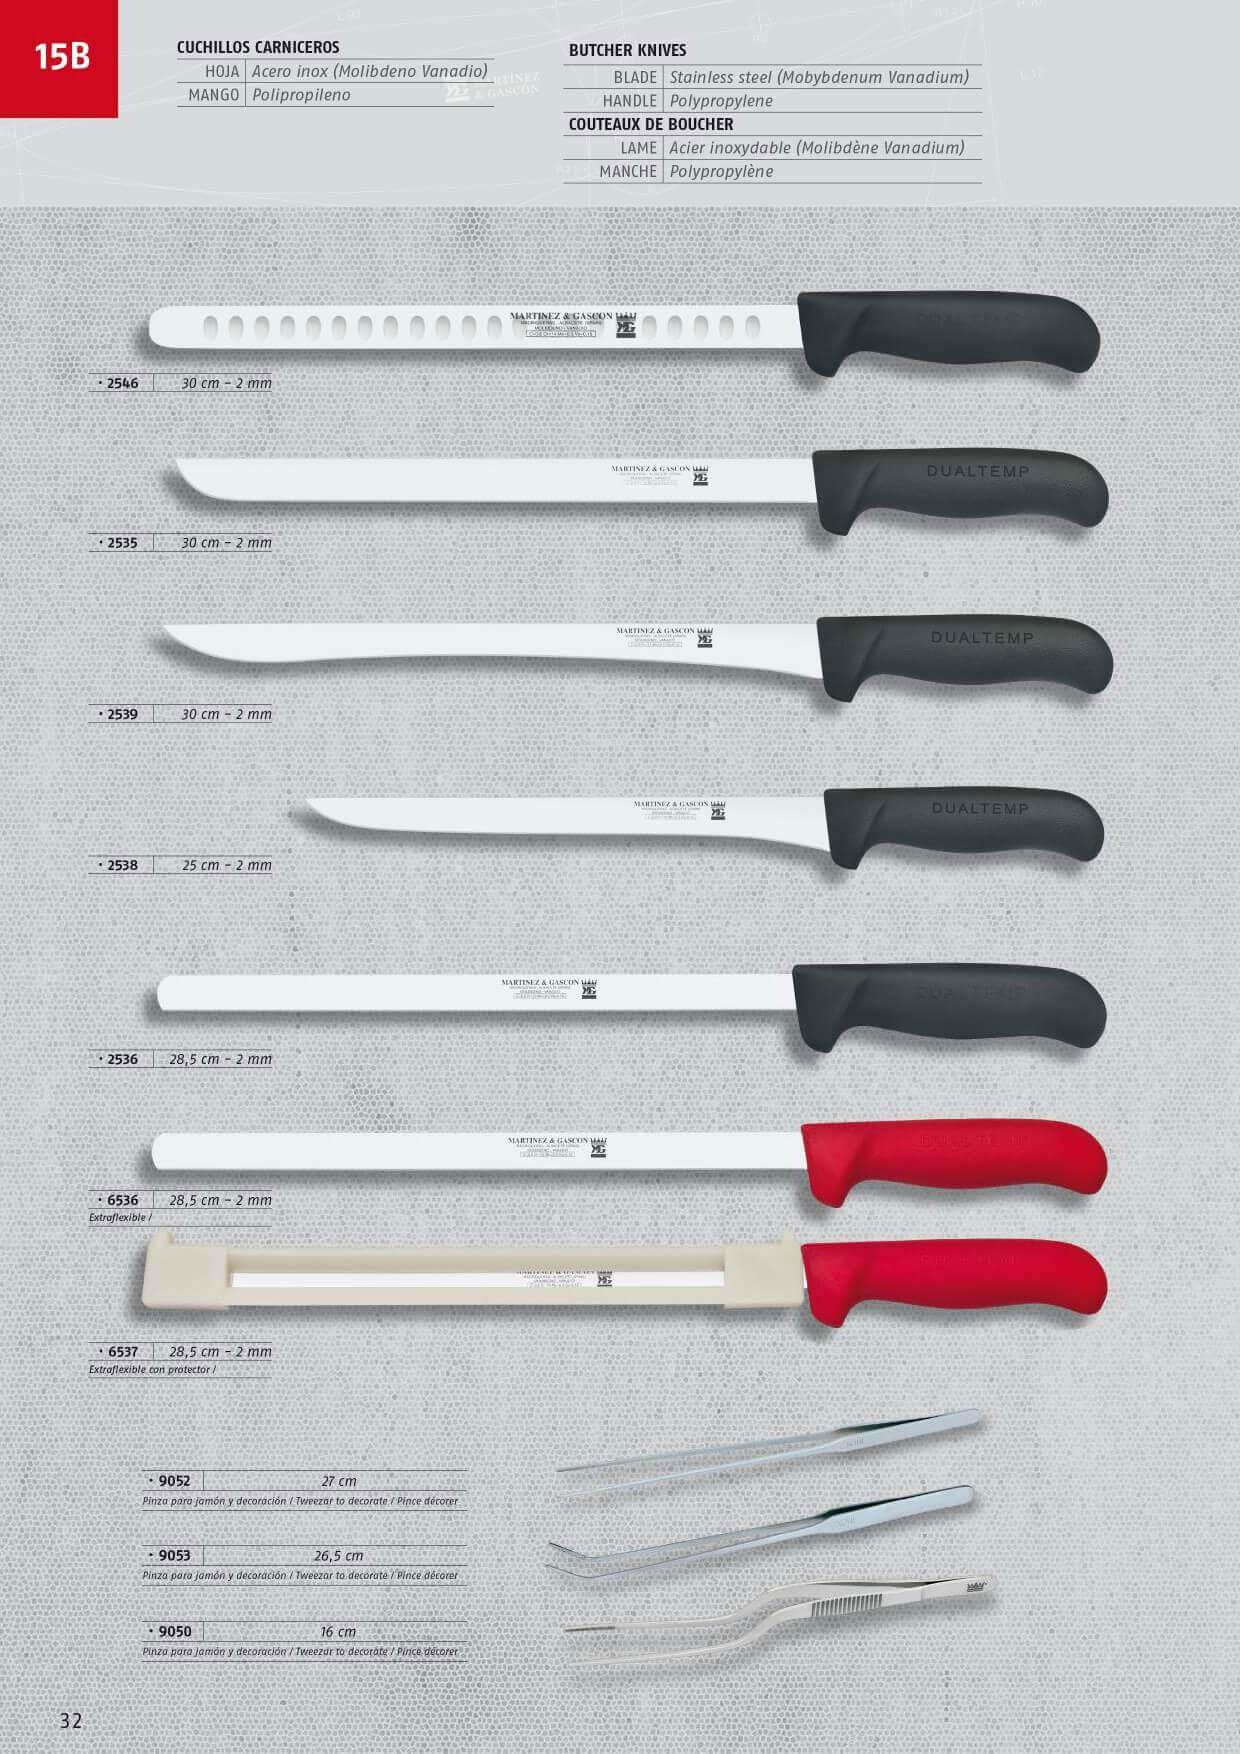 9053 cuchillos jamon y salmon martinez gascon for Cuchilleria profesional cocina